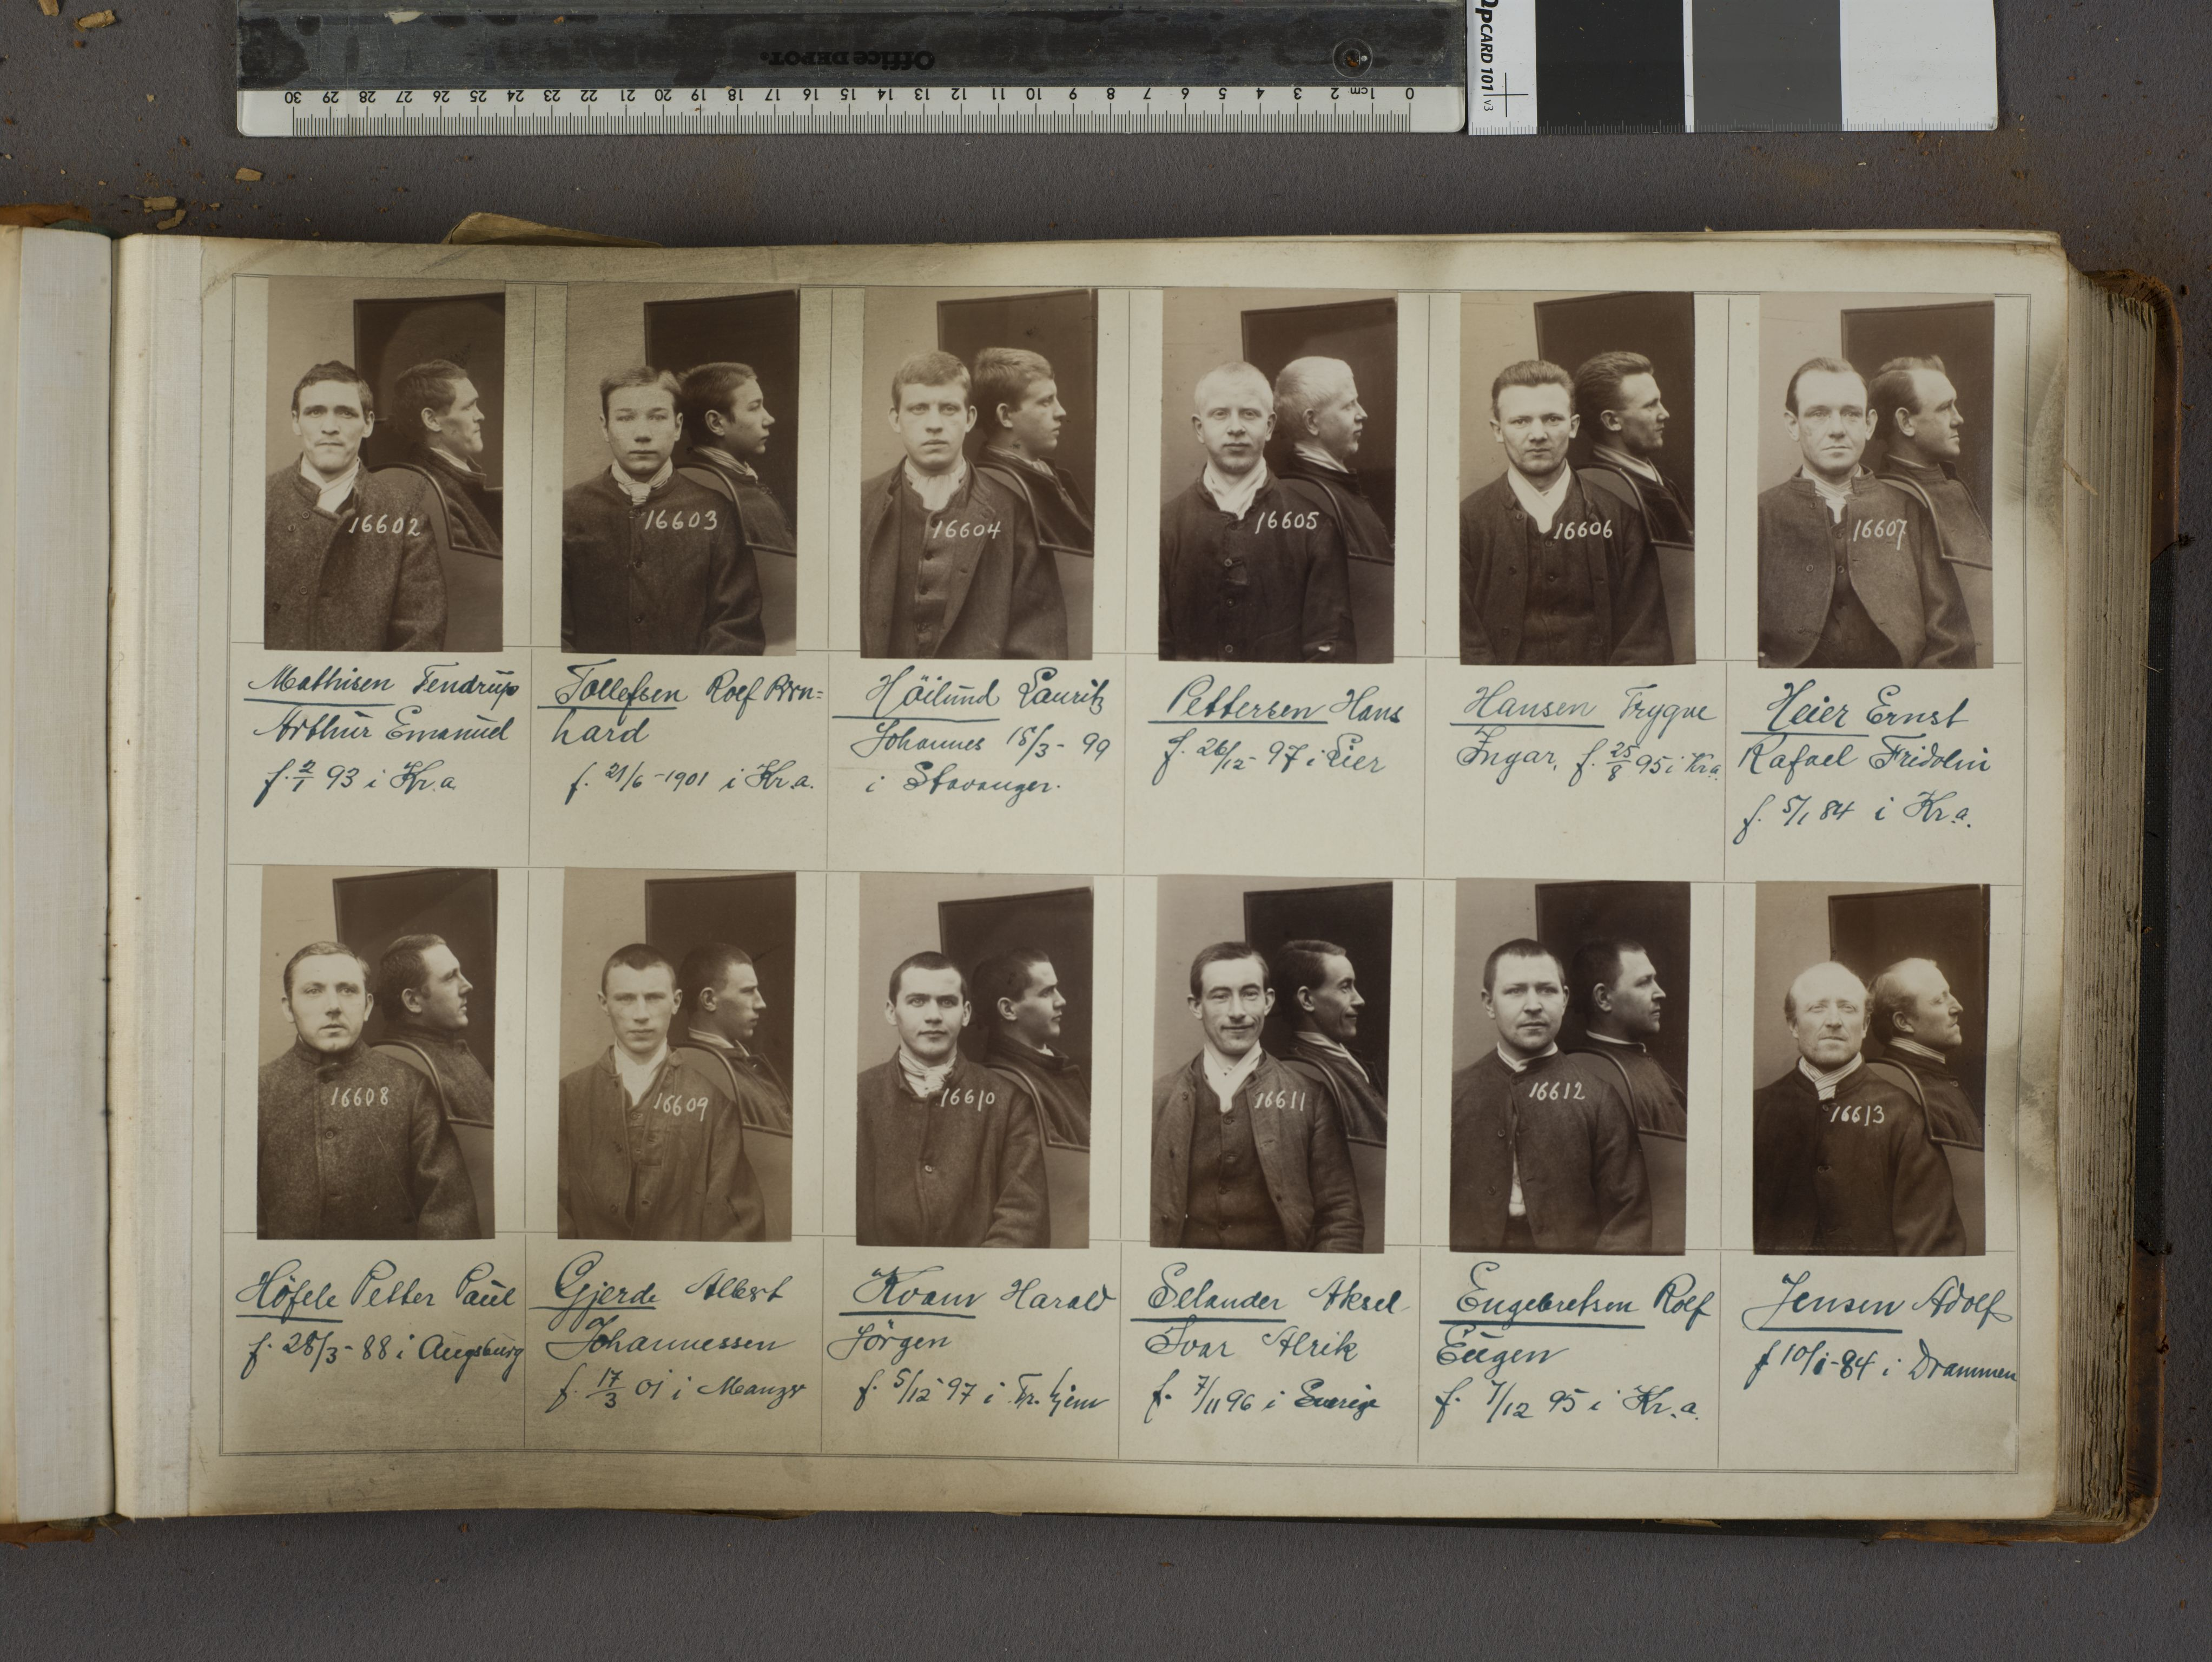 RA, Oslo politikammer, Kriminalavdelingen, U/Ua/L0019: Forbryteralbum, 1920-1921, s. 1